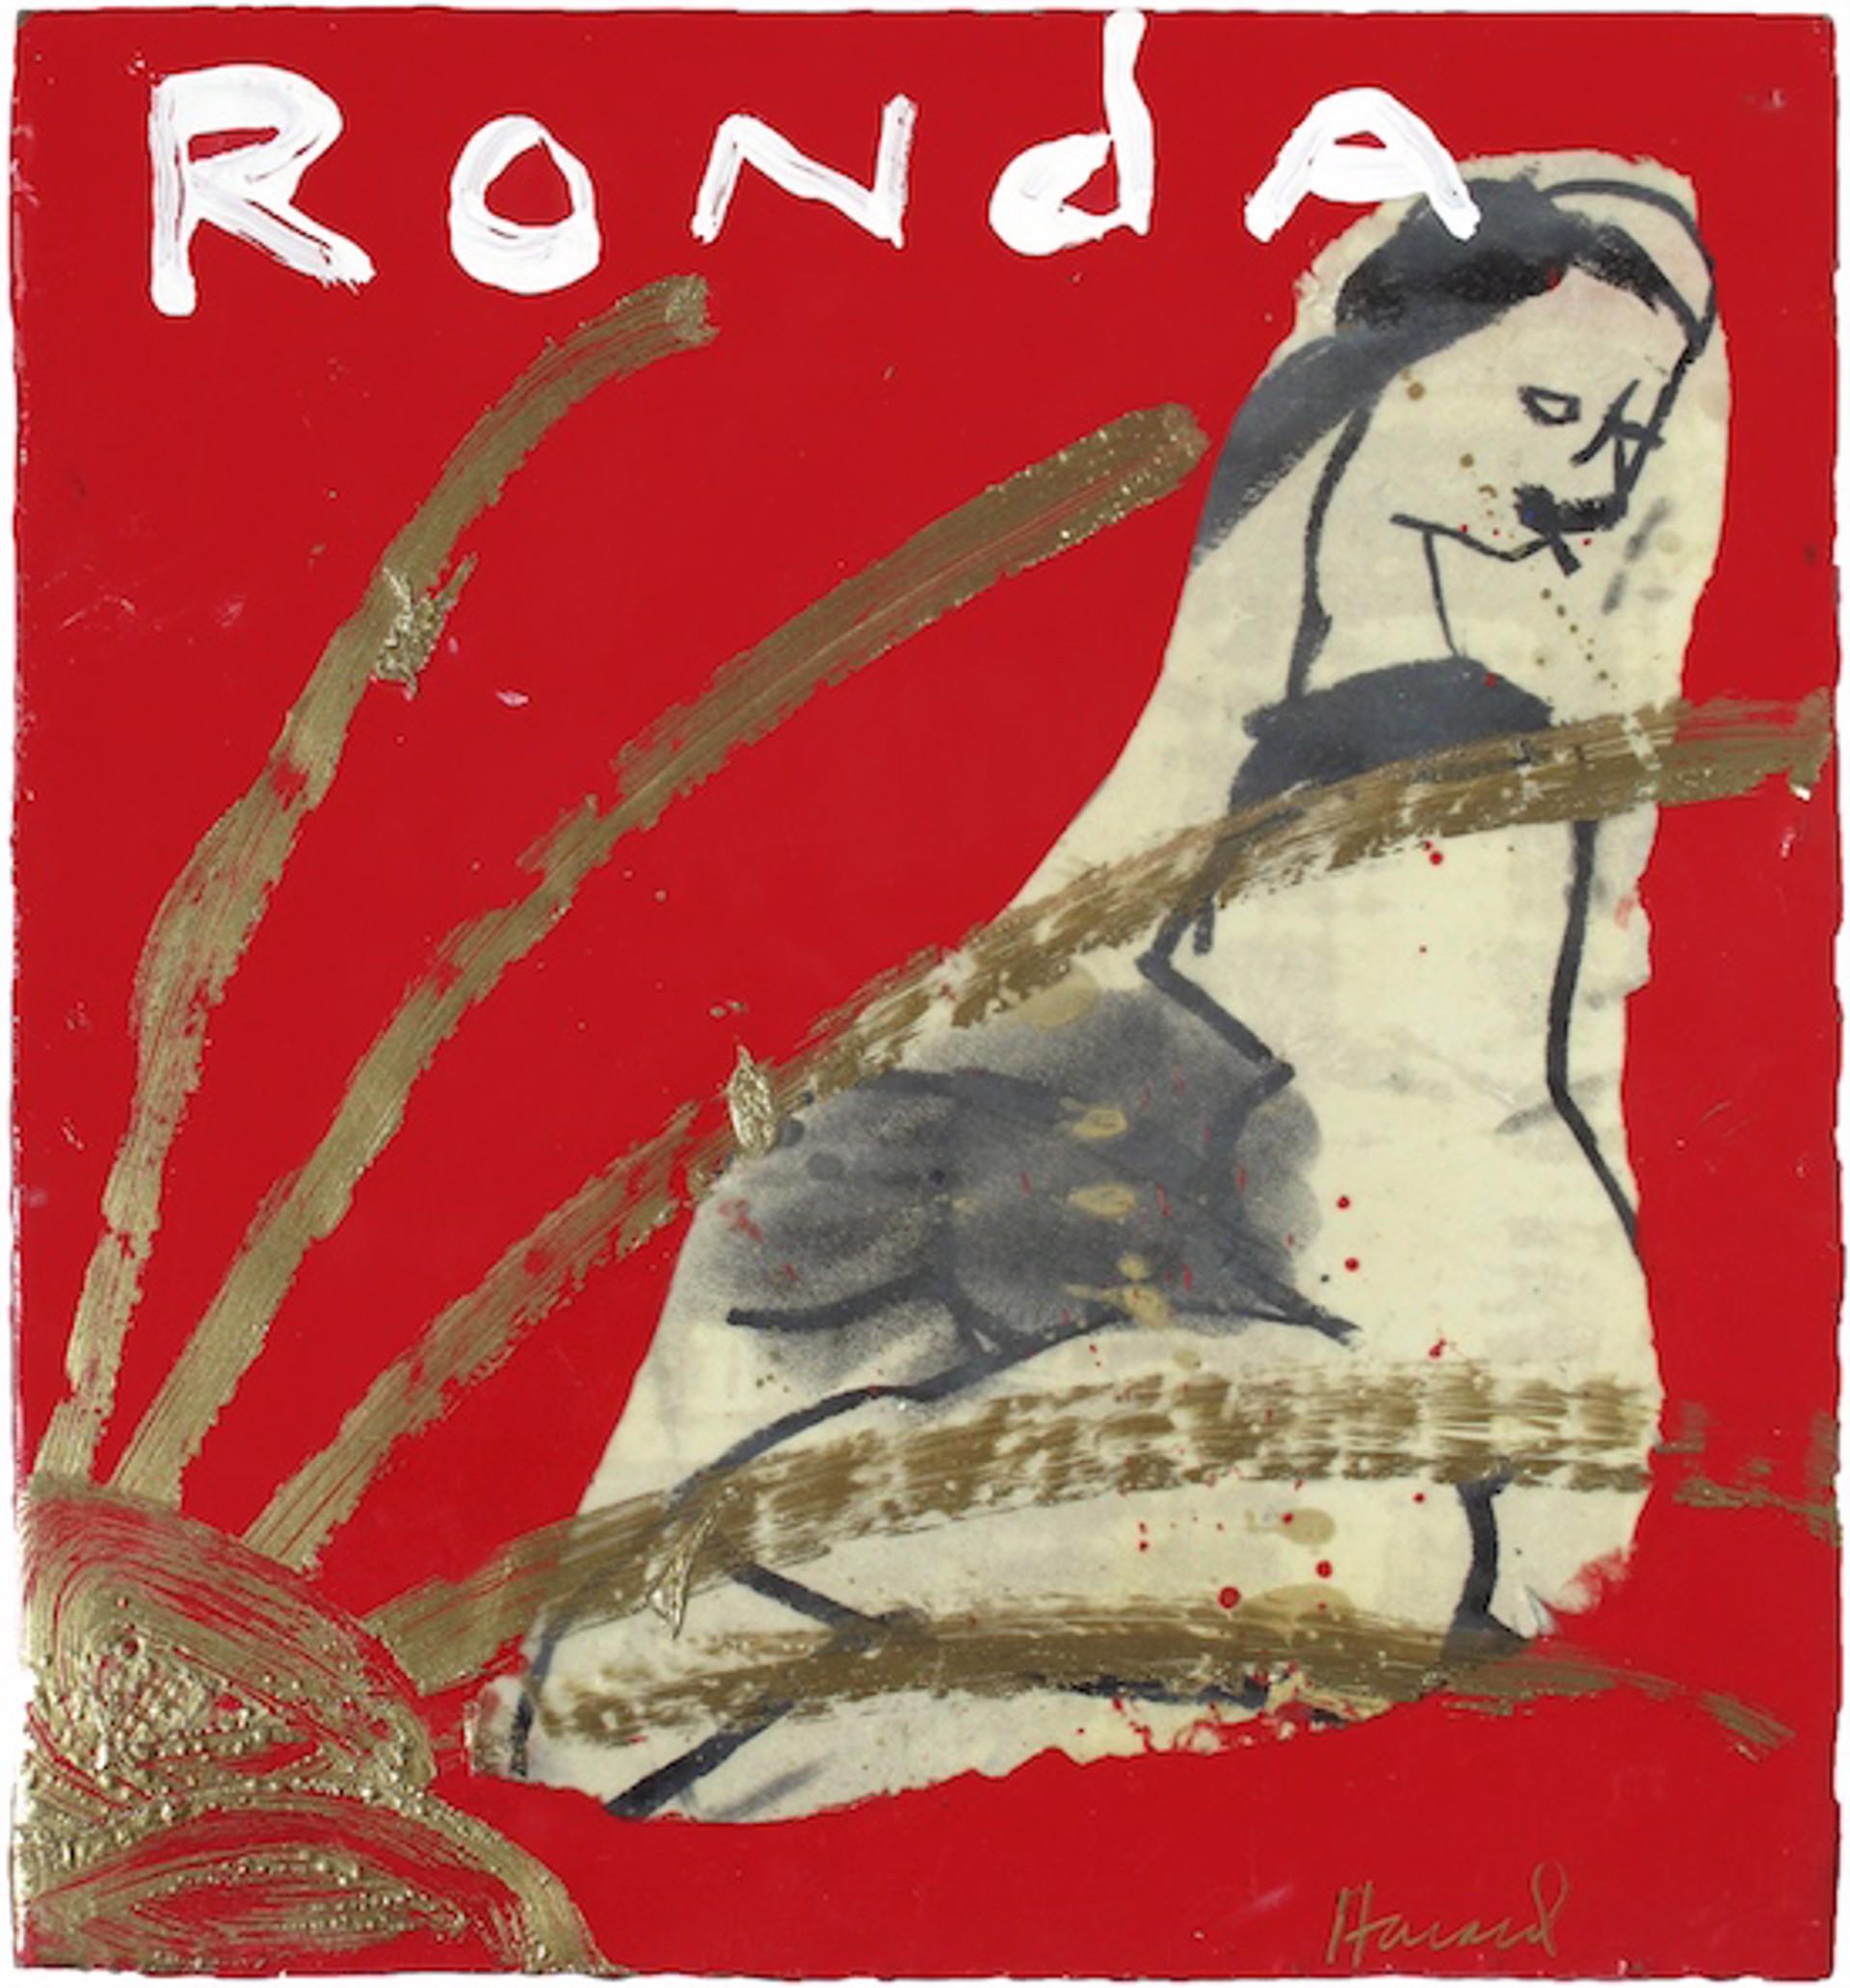 Red Ronda by James Havard